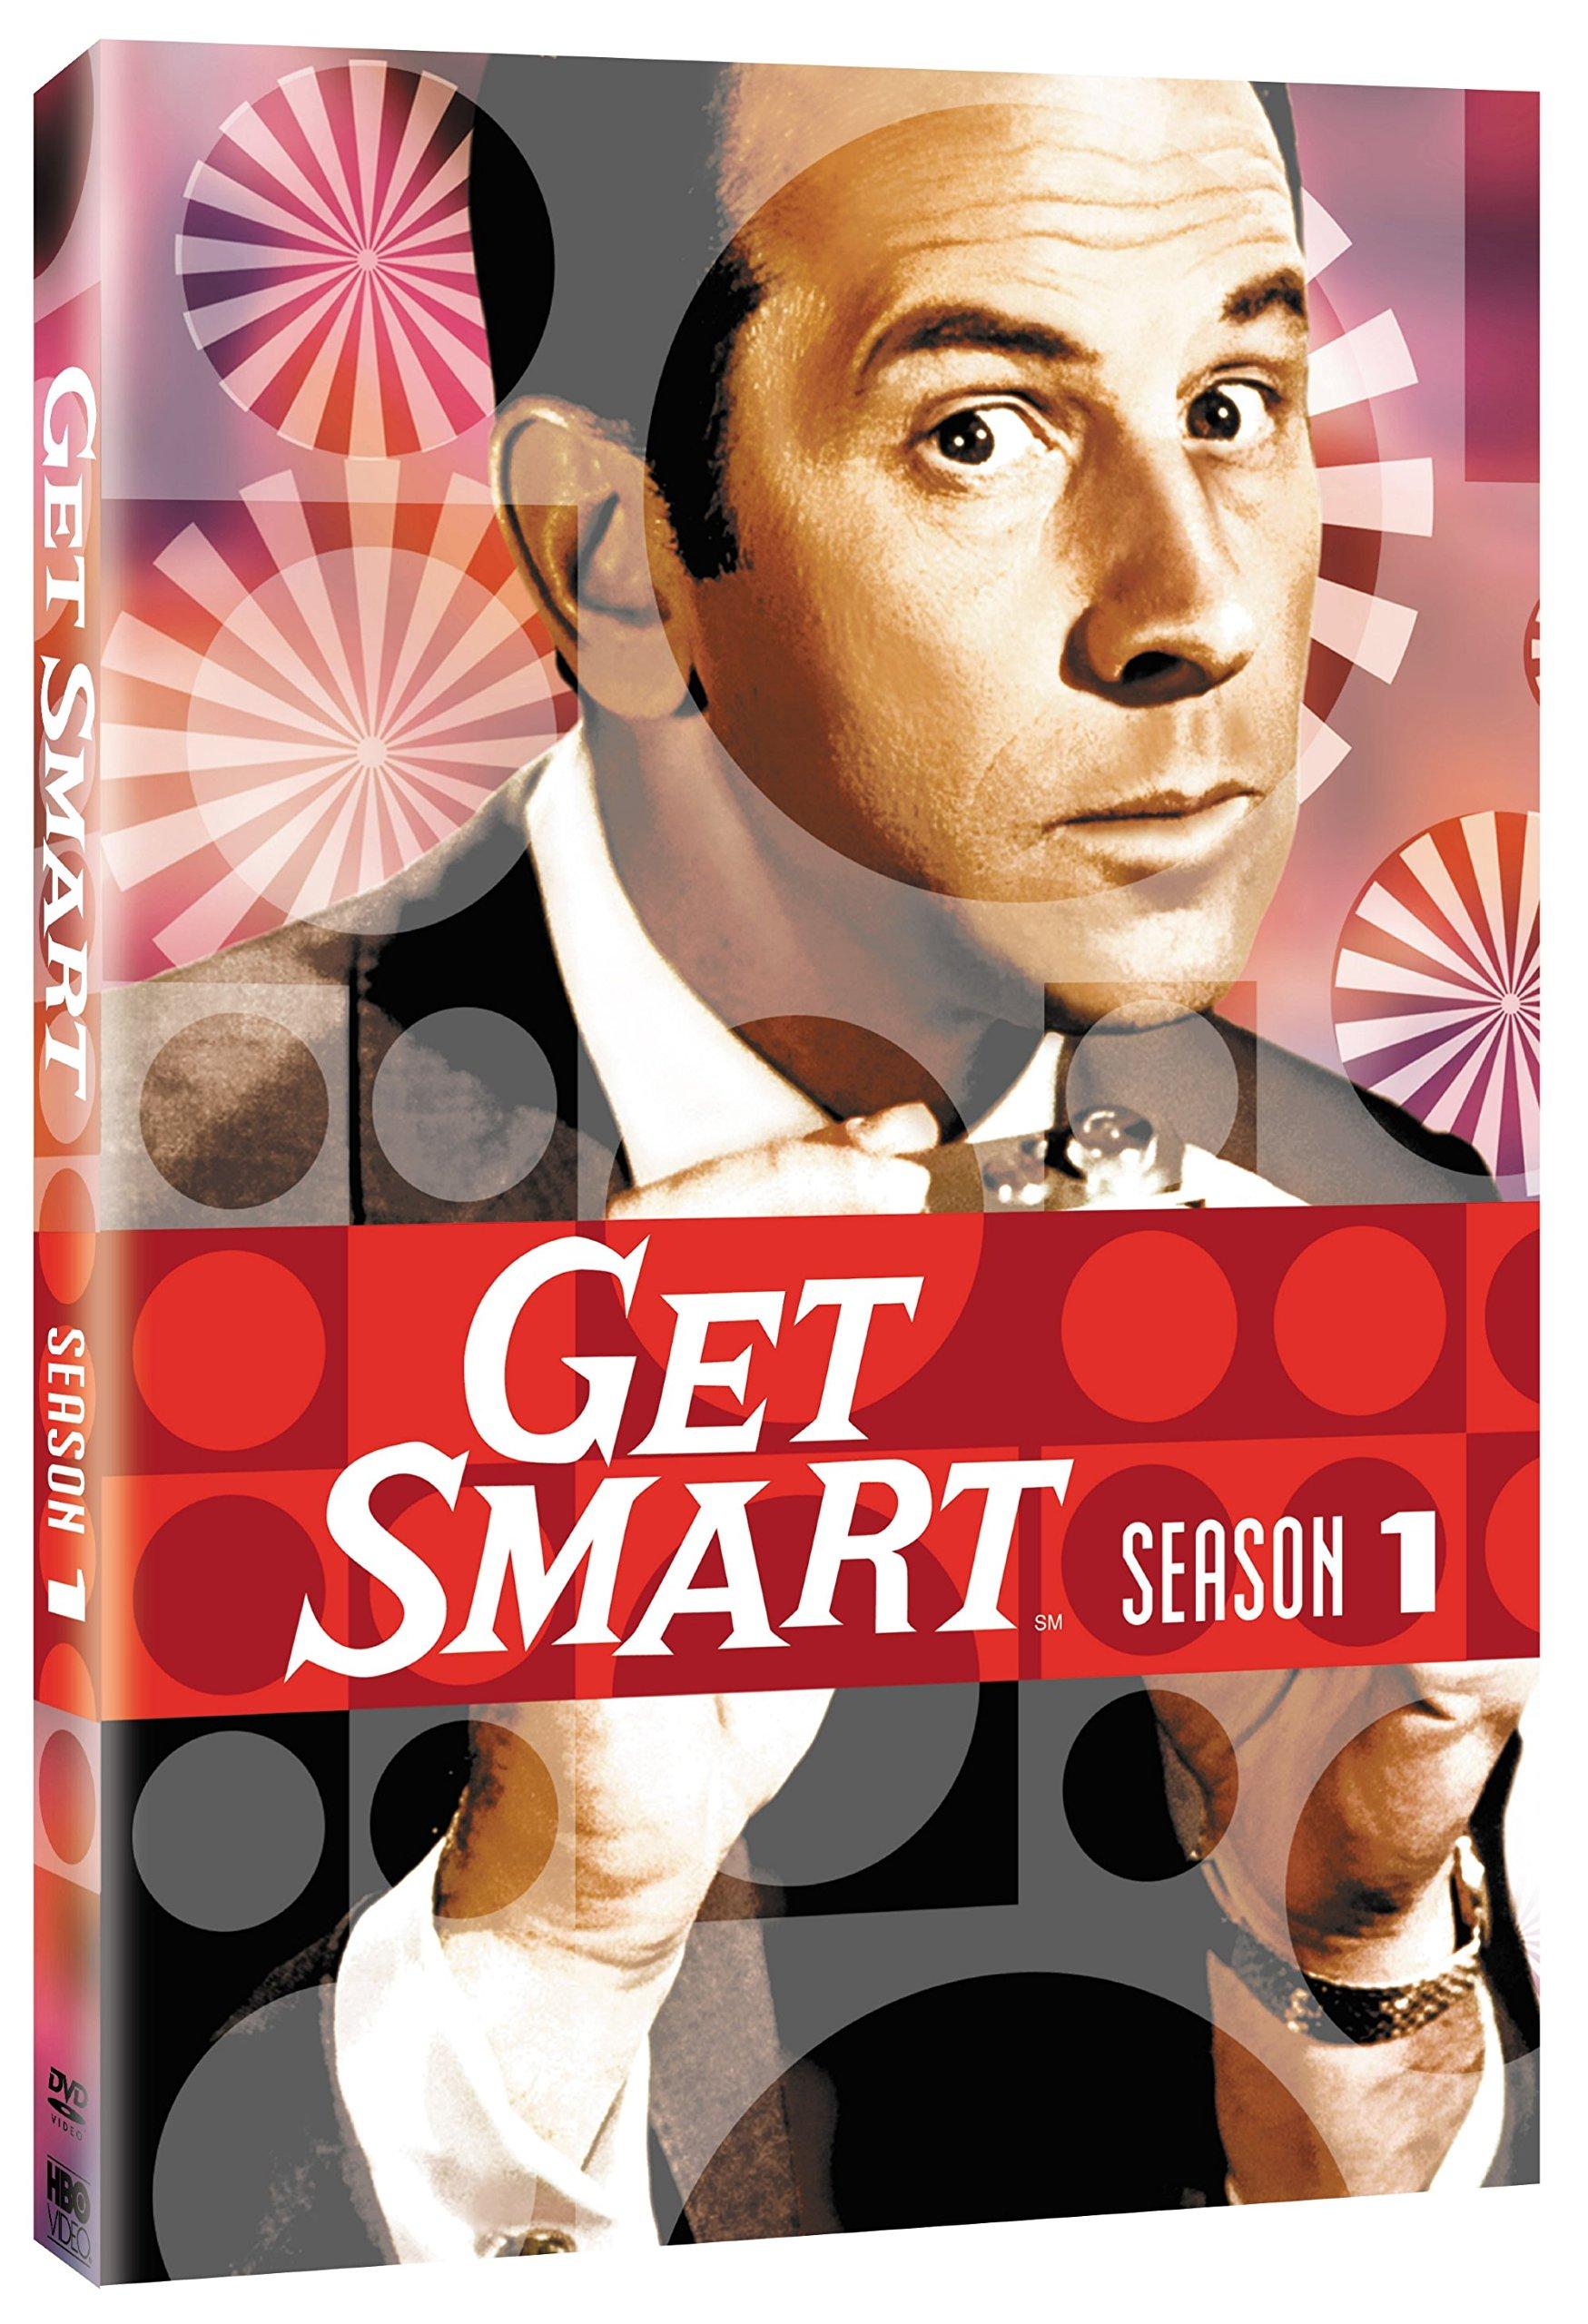 DVD : Get Smart: Season 1 (Remastered, Restored, Standard Screen, 4 Disc)